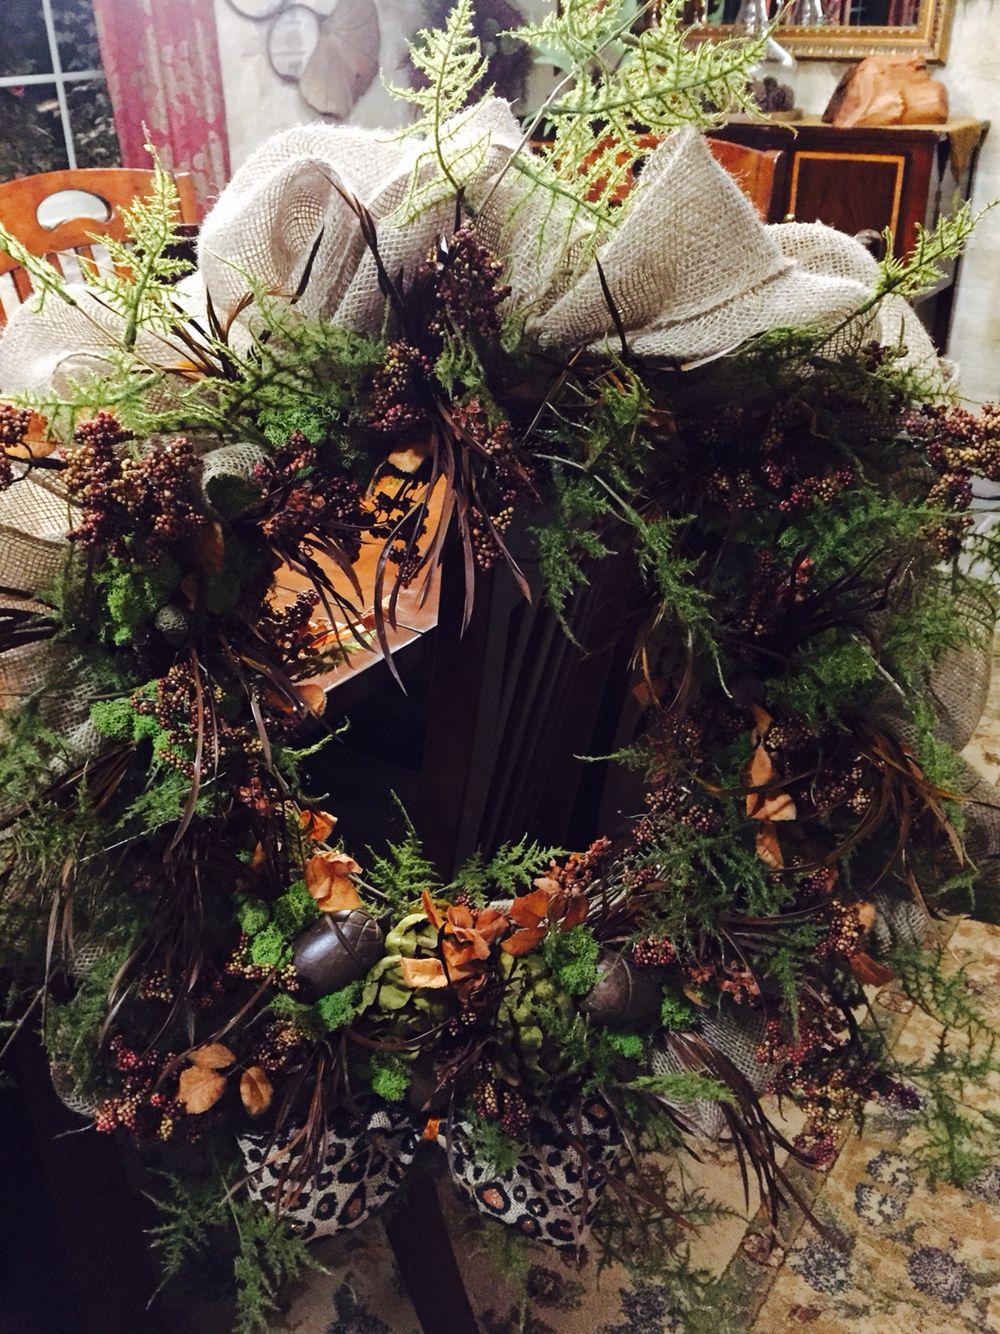 Fall wreath I made...burlap, moss, greenery, feathers, wooden acorns